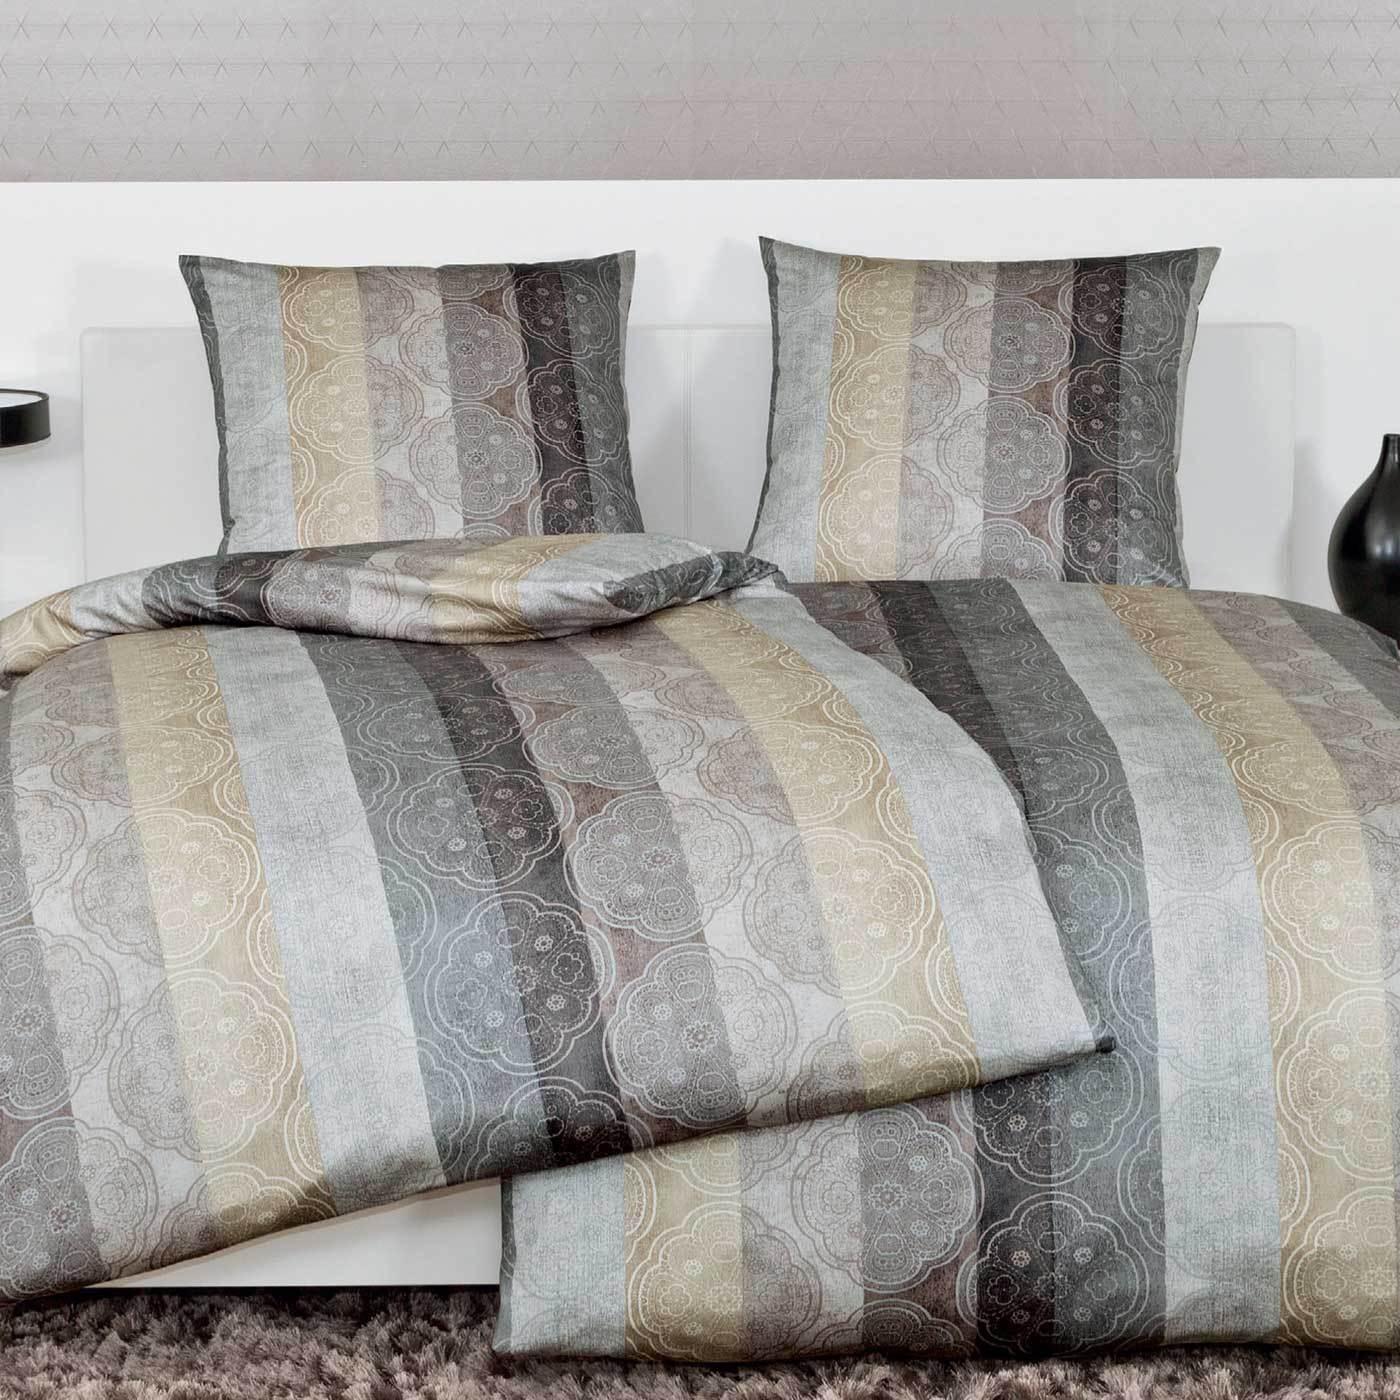 Постельное белье 1.5 спальное Janine Messina 4720 taupe-kitt-silber